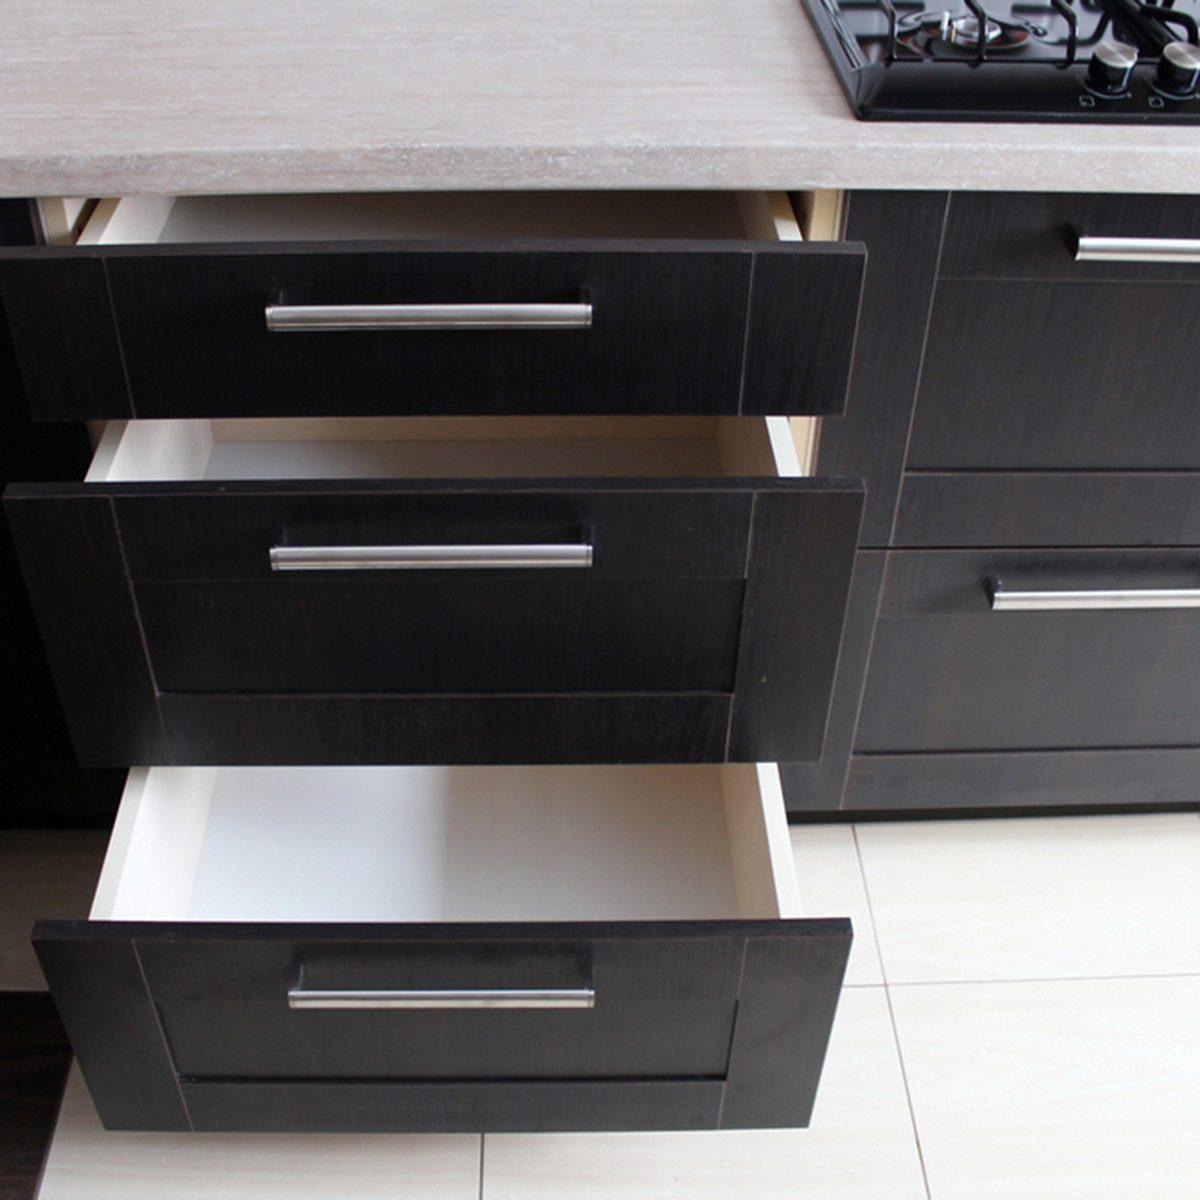 Popular Kitchen Cabinet Colors: Dark Espresso